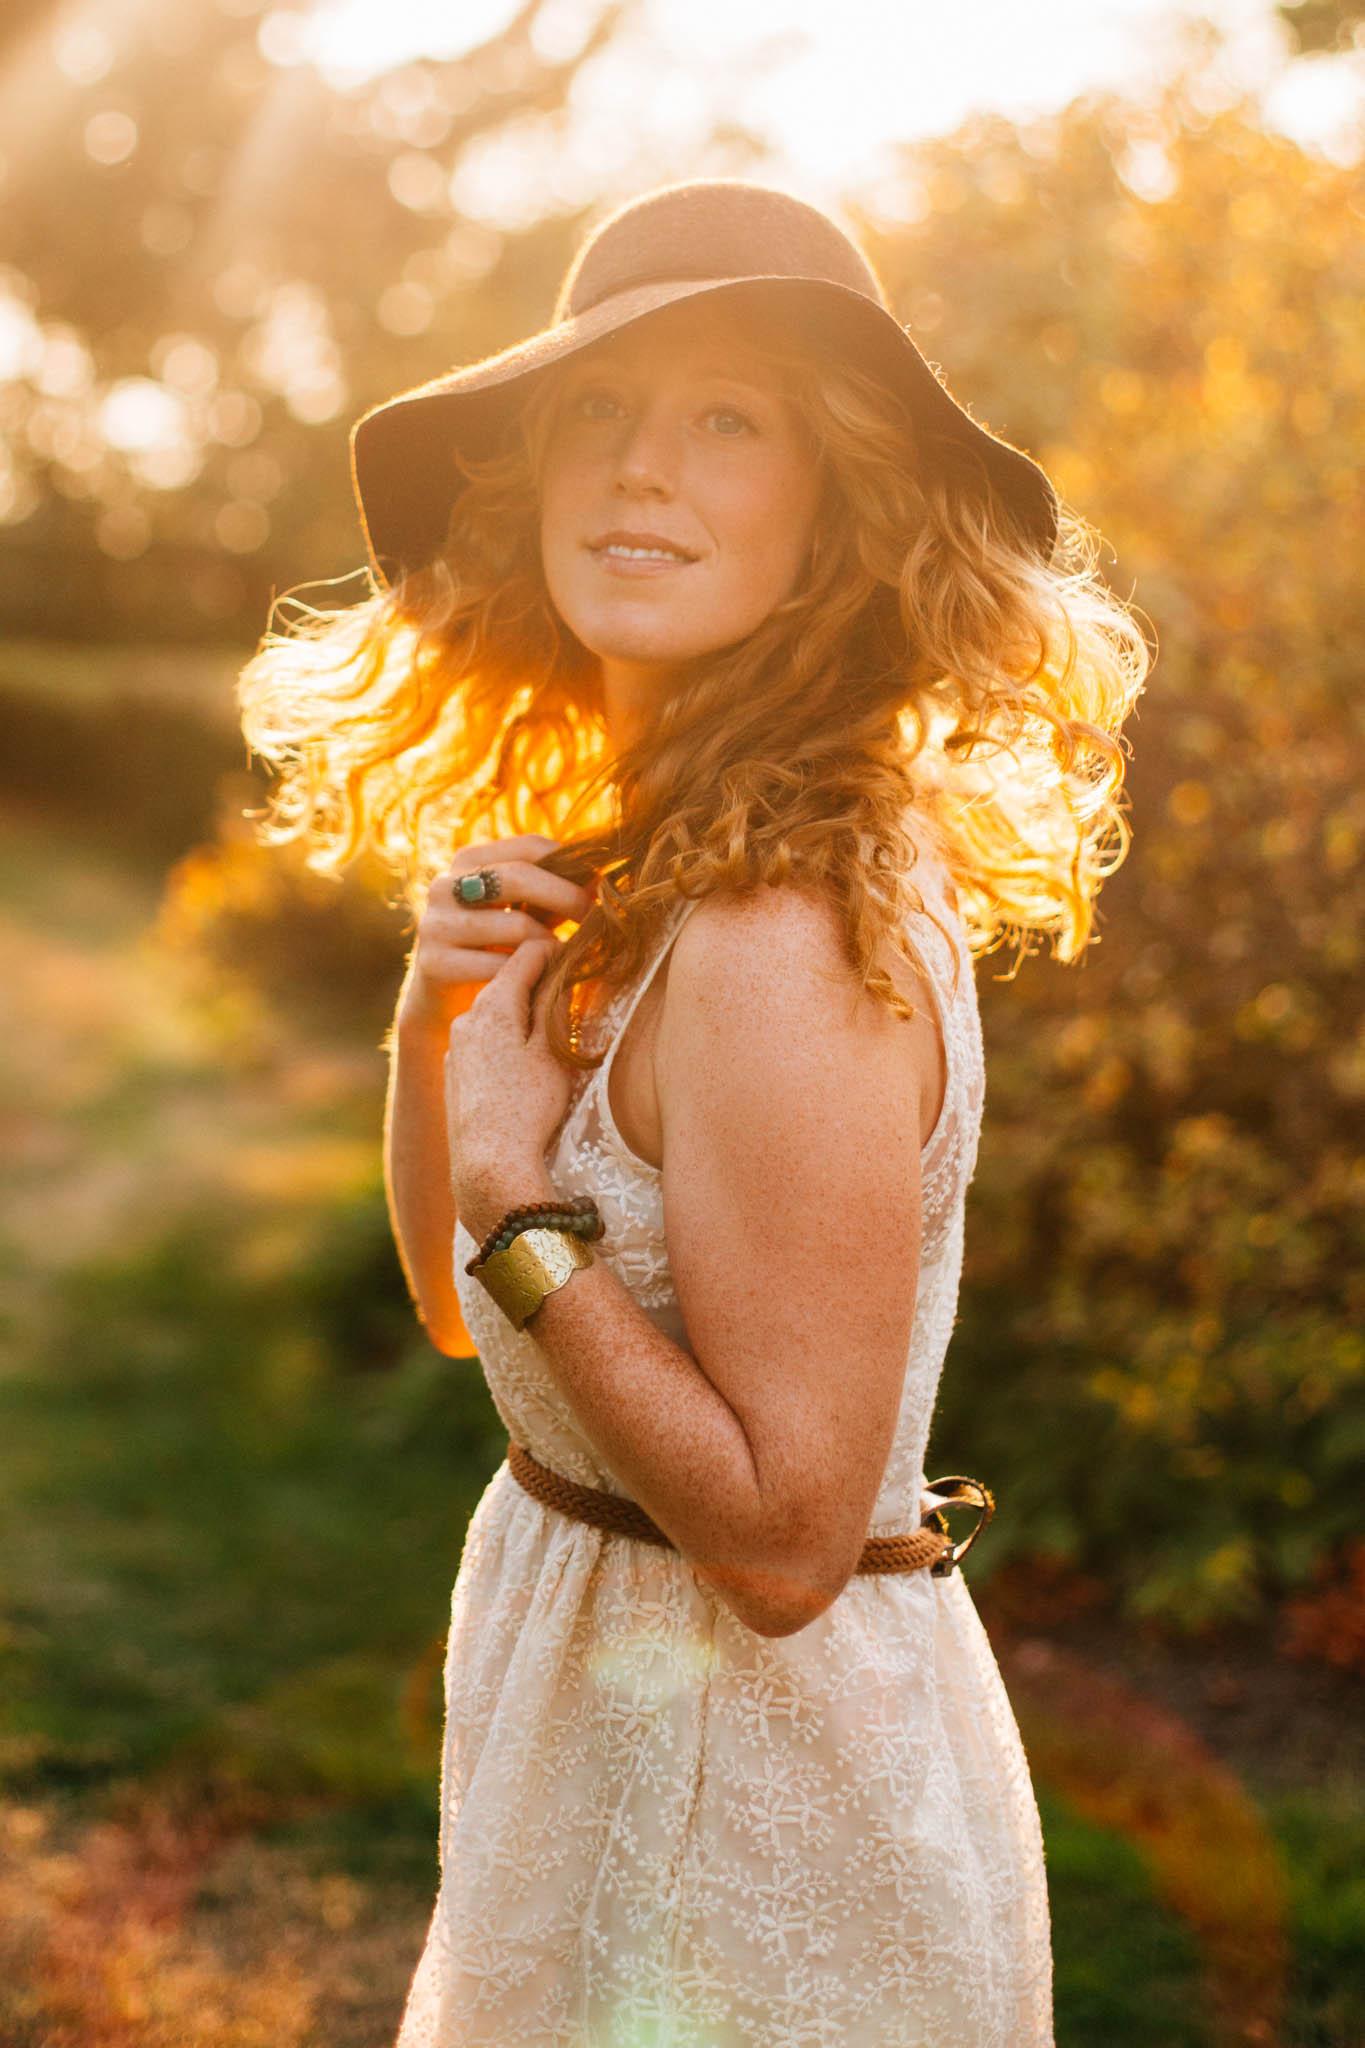 Vancouver Lifestyle Portrait Photographer-Emmy Lou Virginia Photography-5.jpg